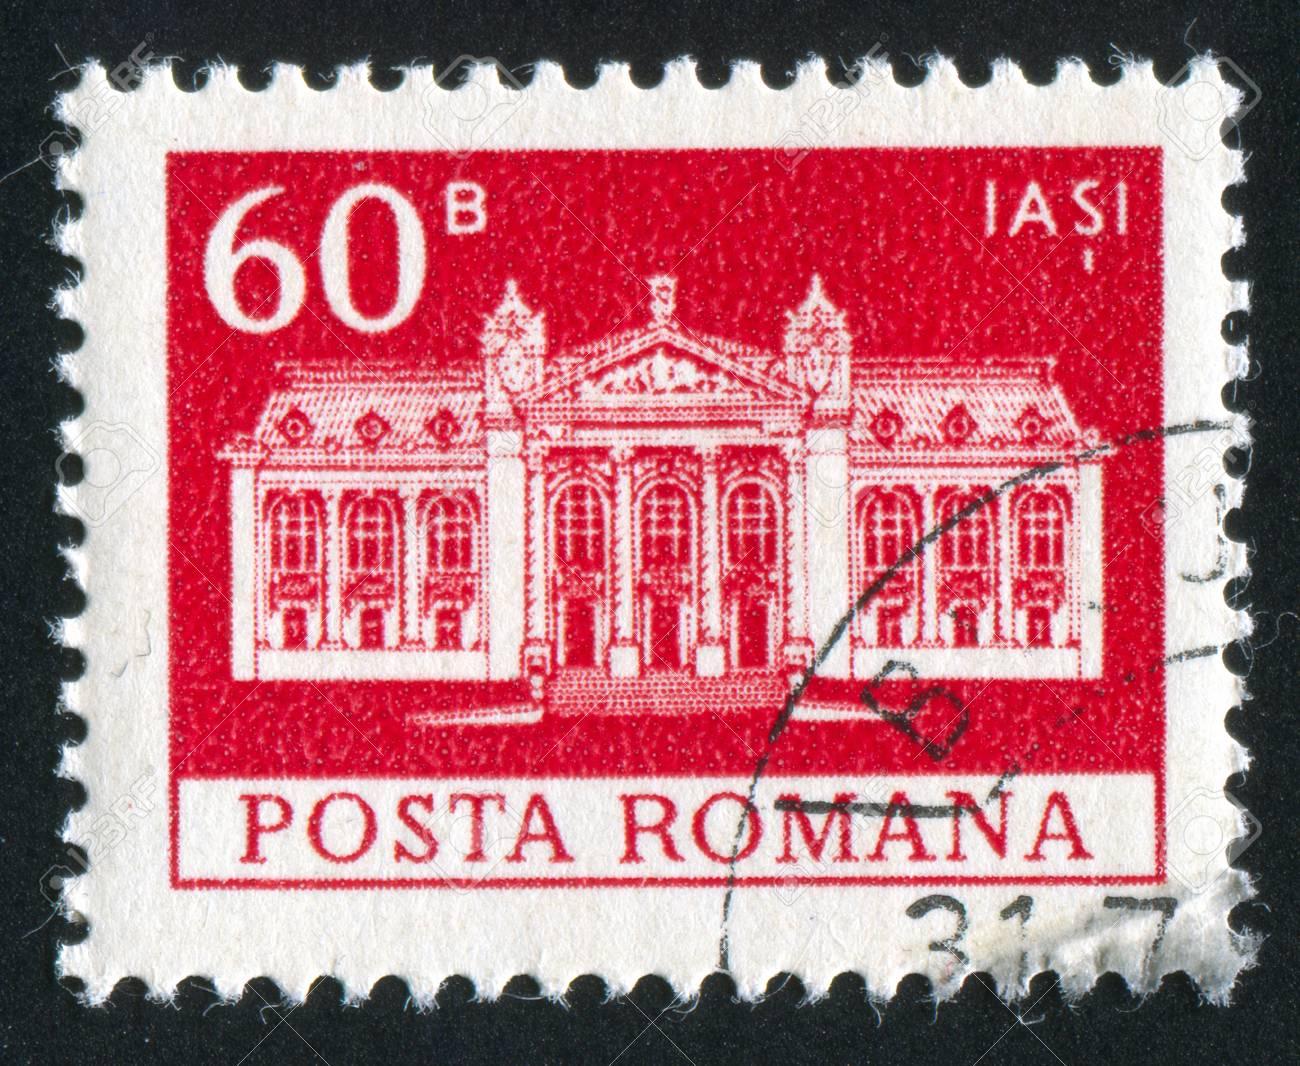 ROMANIA - CIRCA 1973: stamp printed by Romania, shows National Theater, Iasi, circa 1973 Stock Photo - 10839348